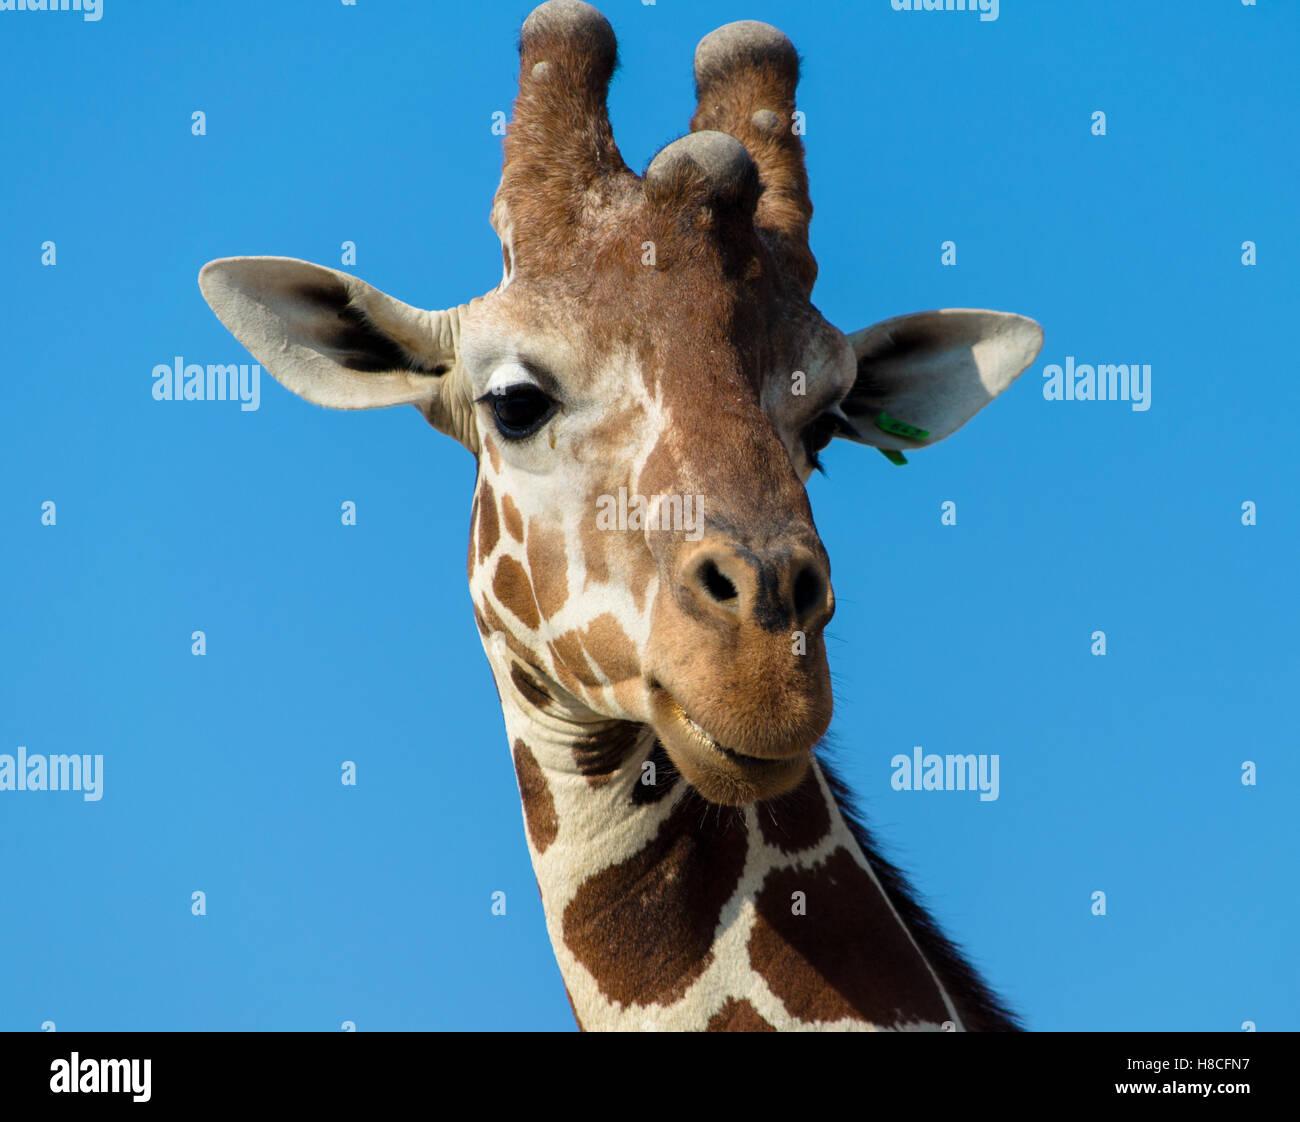 A giraffe portrait - Stock Image